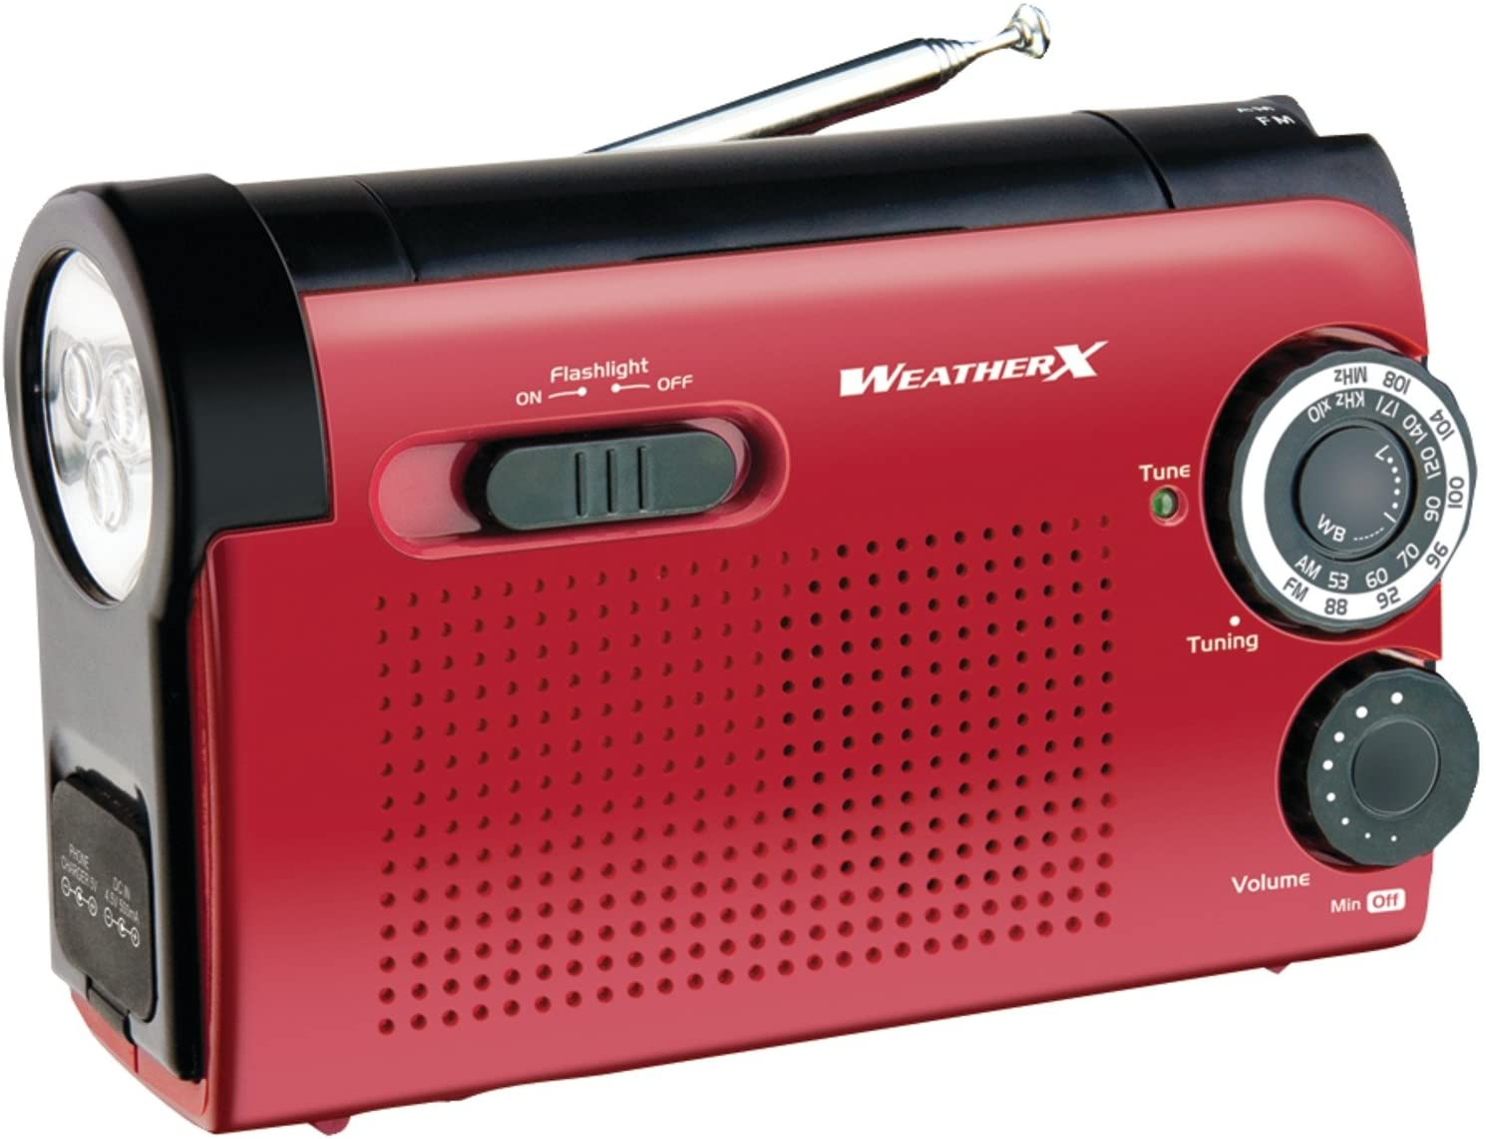 Weatherx WeatherX WR182R Instant NOAA Weatherband Radio (Black)